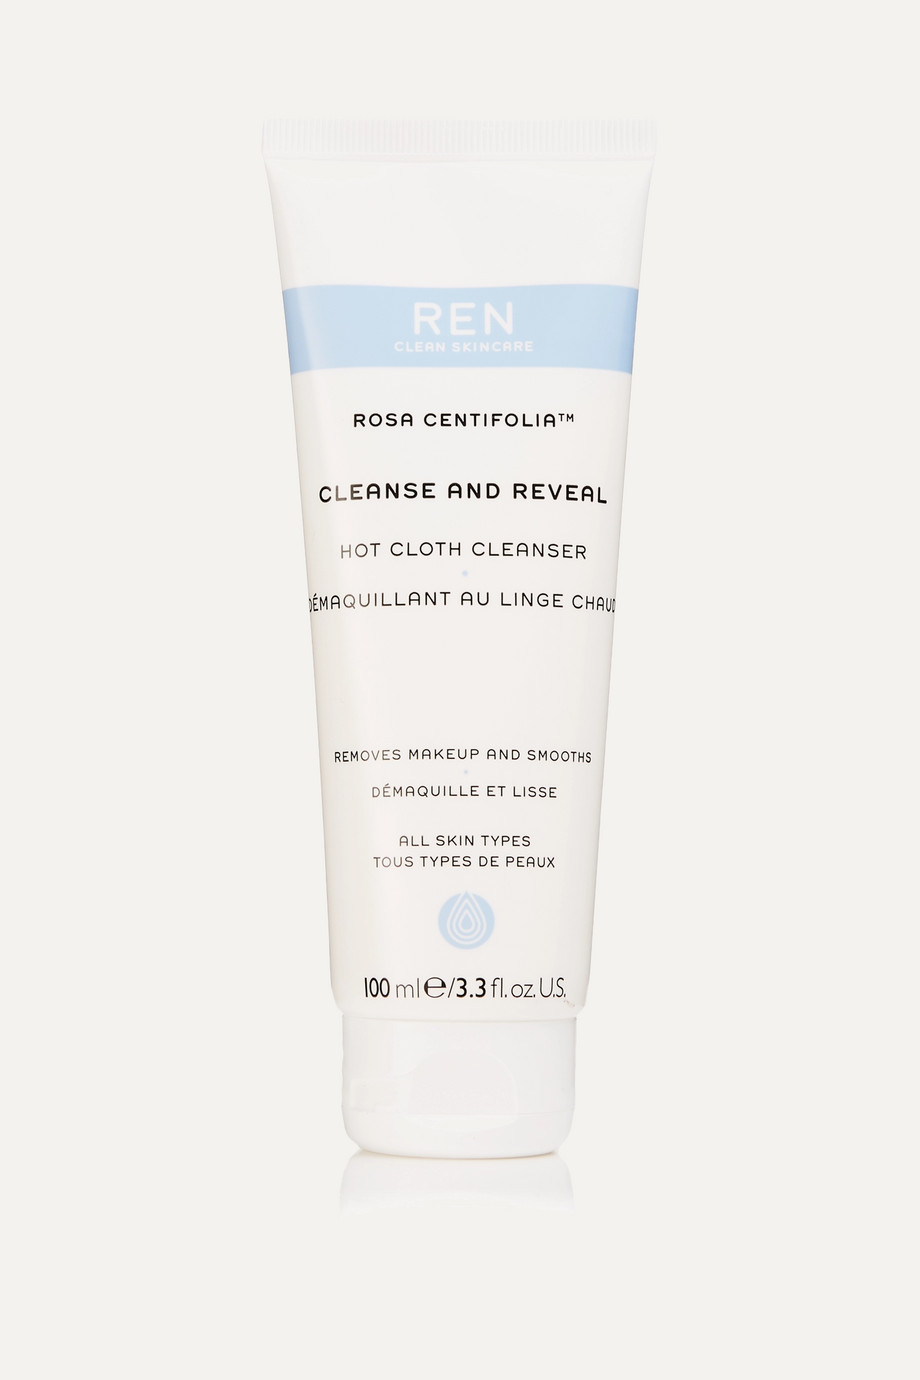 REN Clean Skincare Rosa Centifolia - Cleanse & Reveal Hot Cloth Cleanser, 100ml